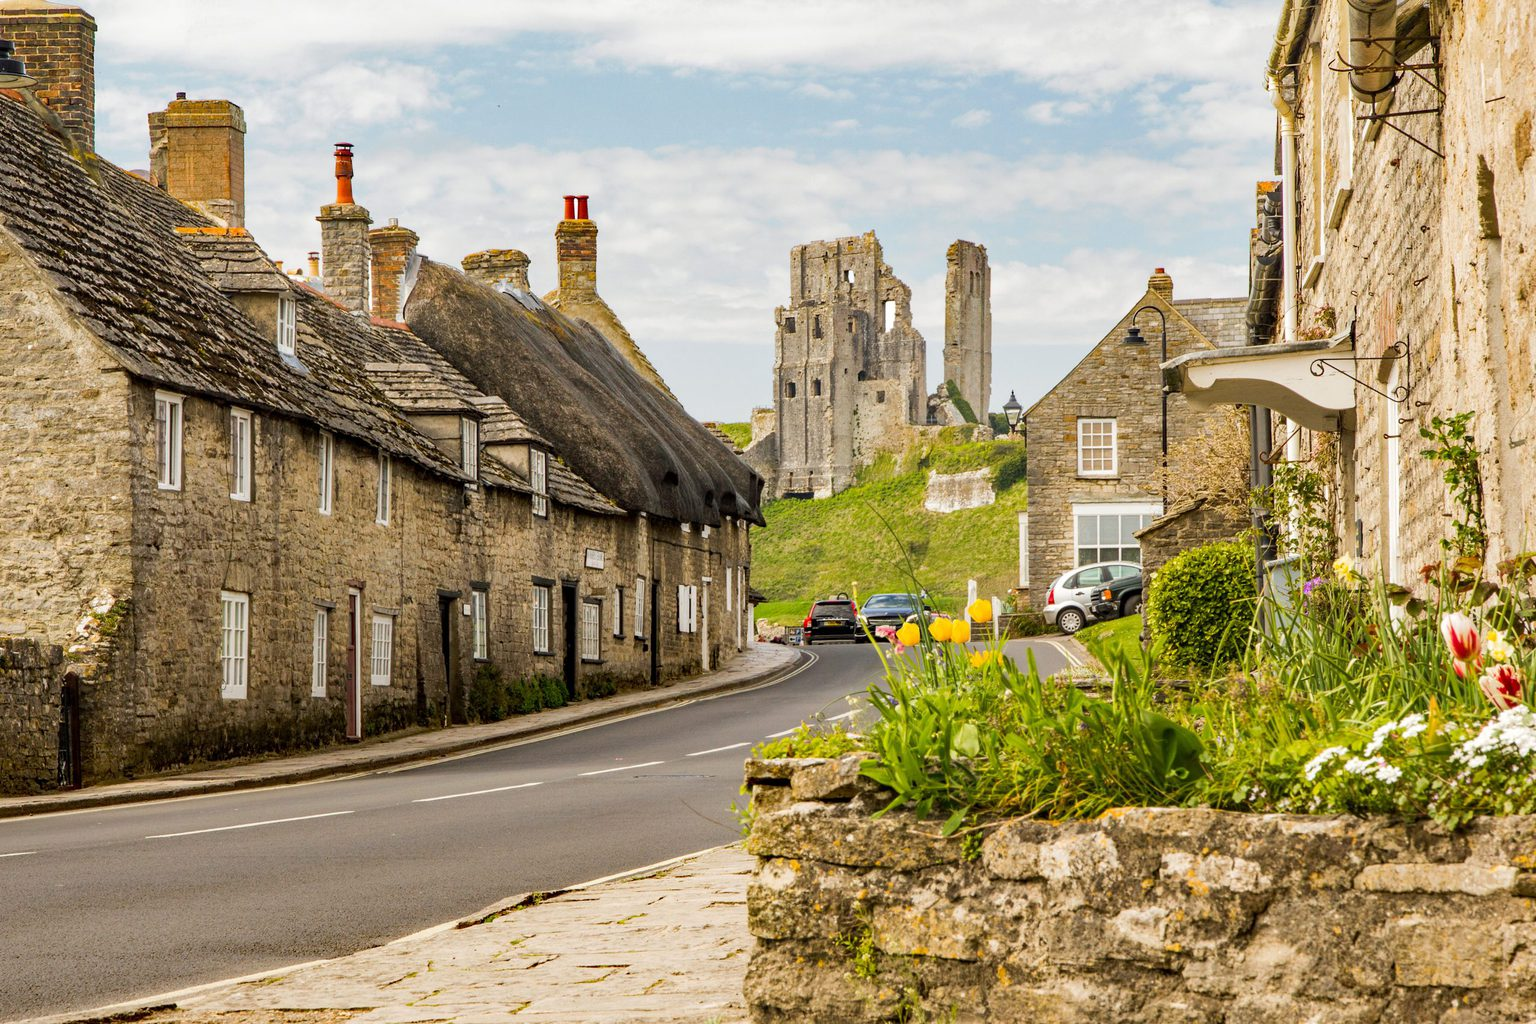 11(+) of the Prettiest Villages in Dorset